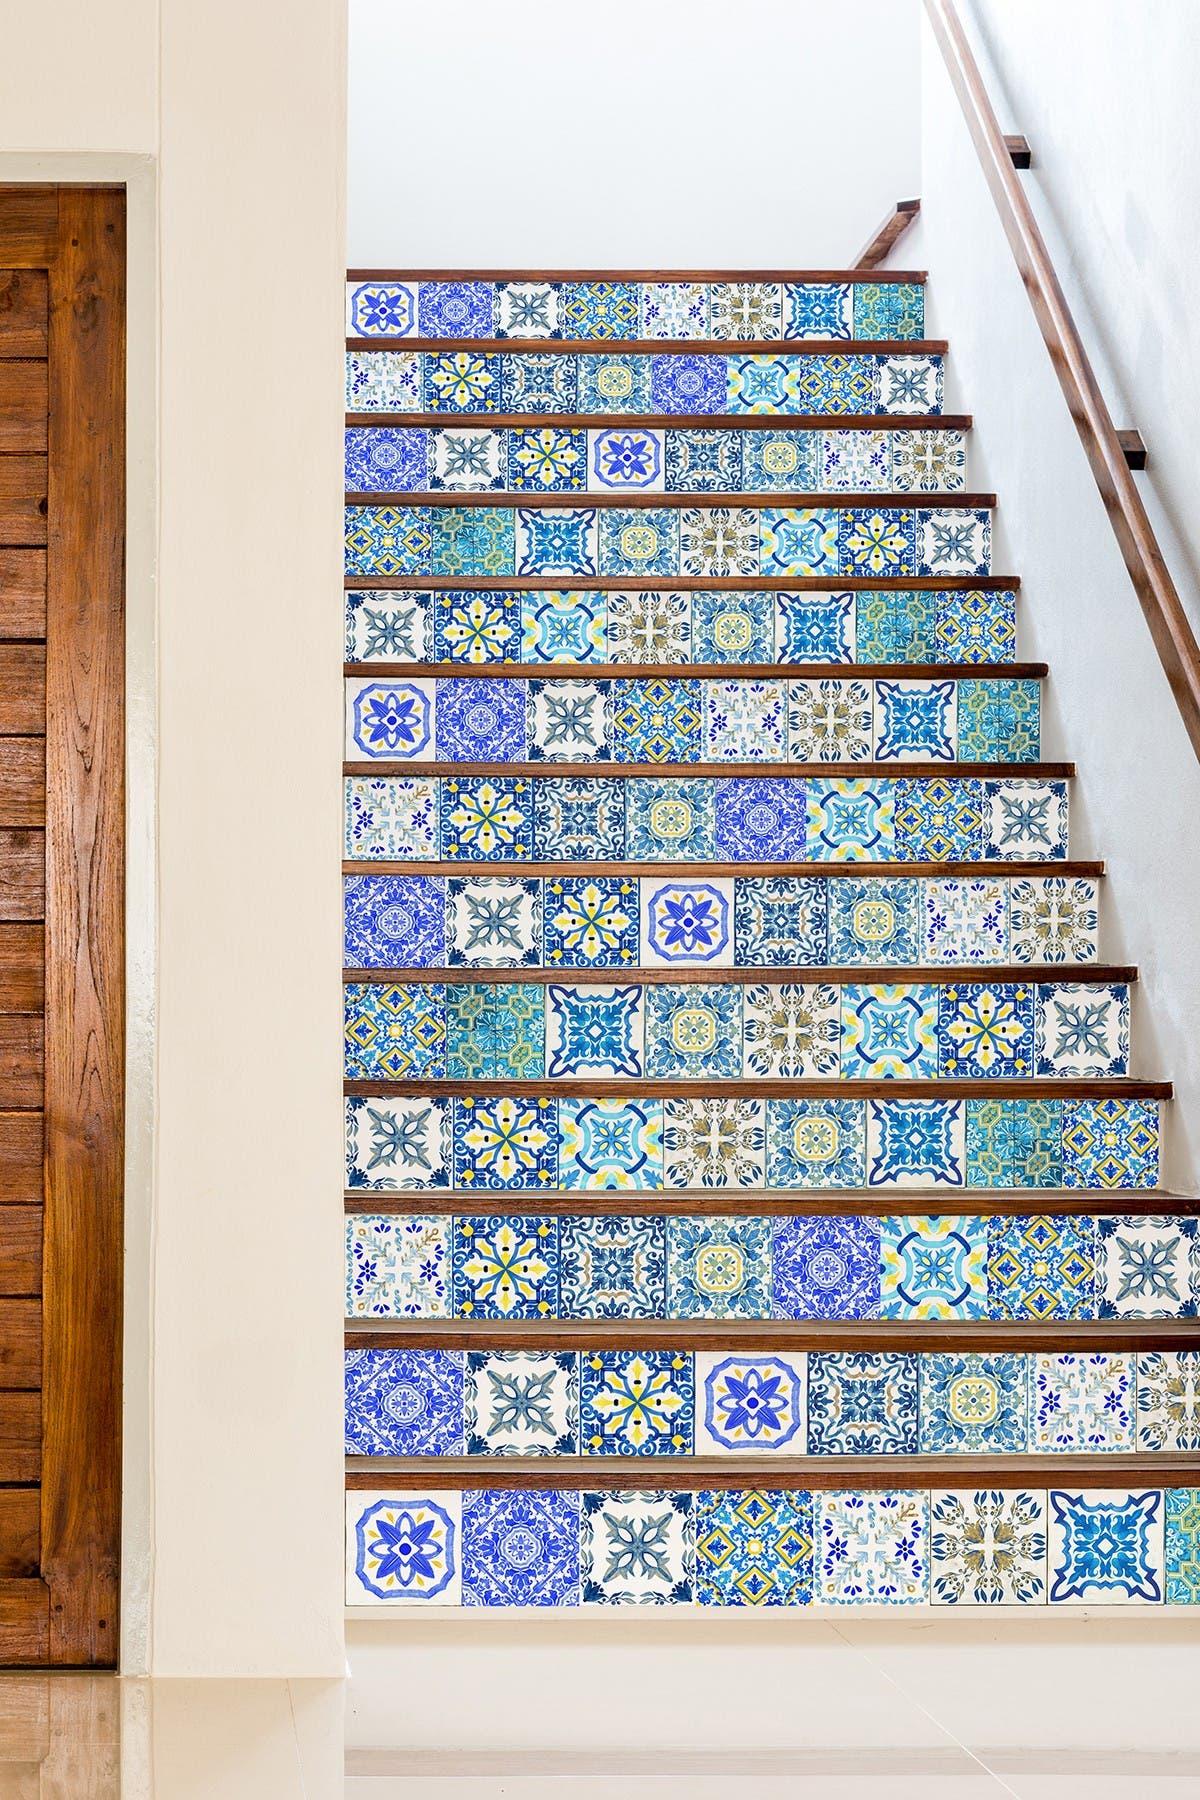 Image of WalPlus Blue Skye Classic Mosaic Wall Sticker Decal